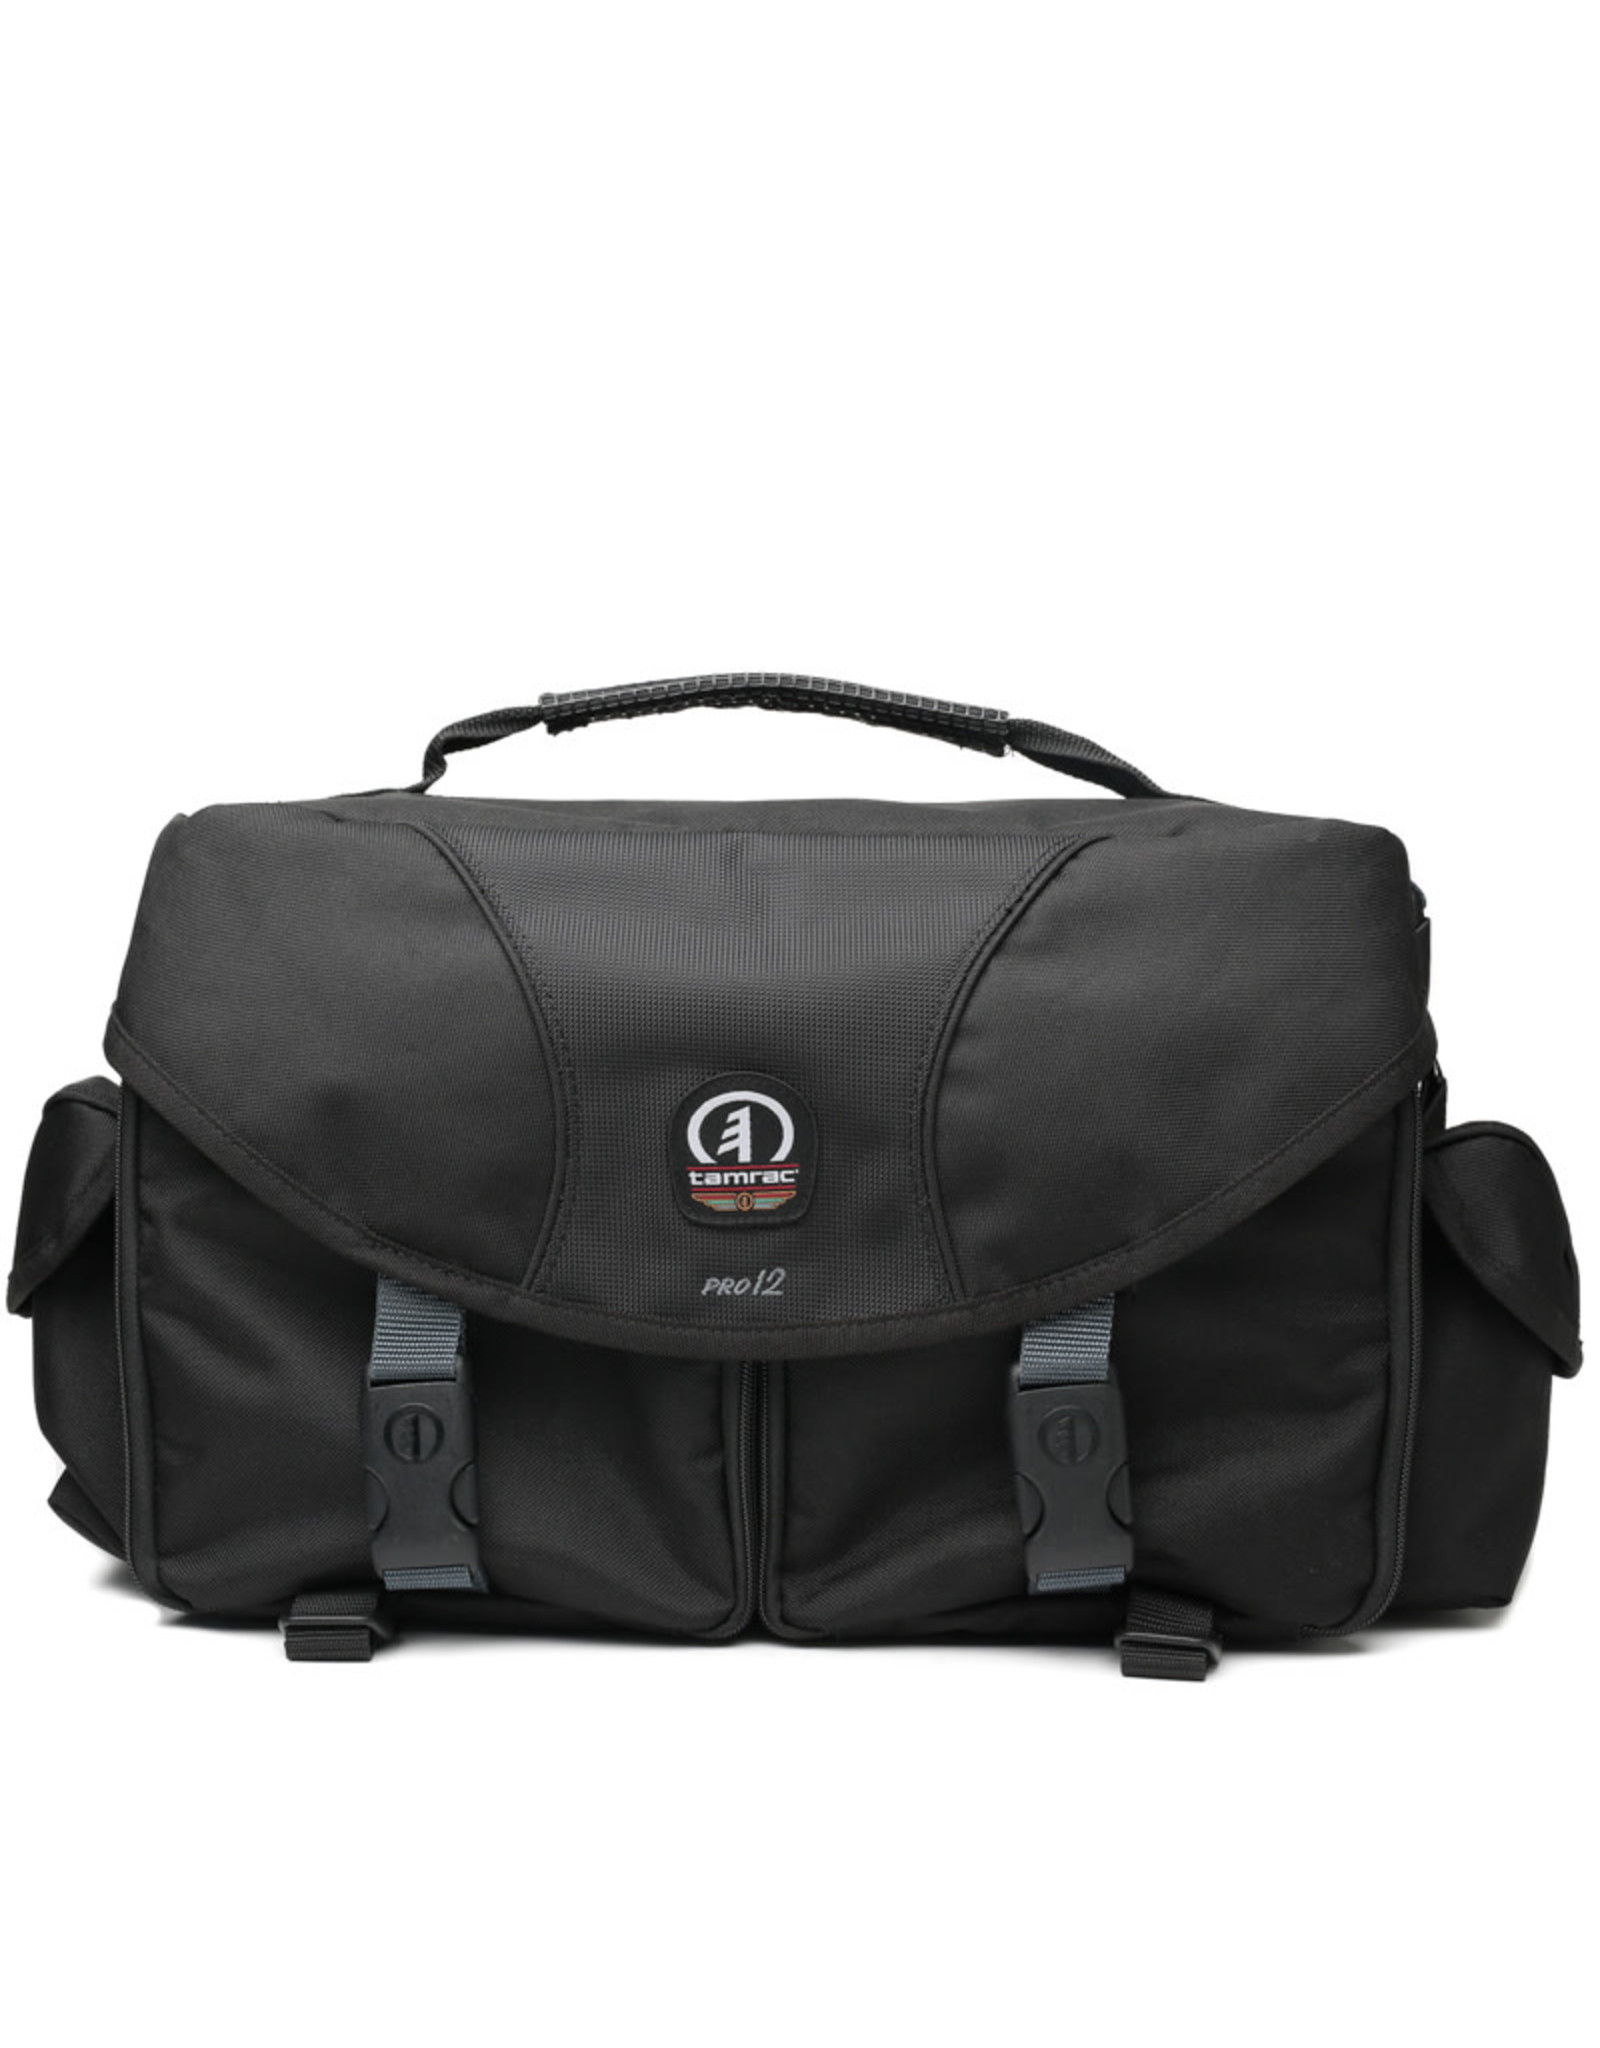 Tamrac Tamrac 5612 Pro 12 Large Shoulder Camera Bag